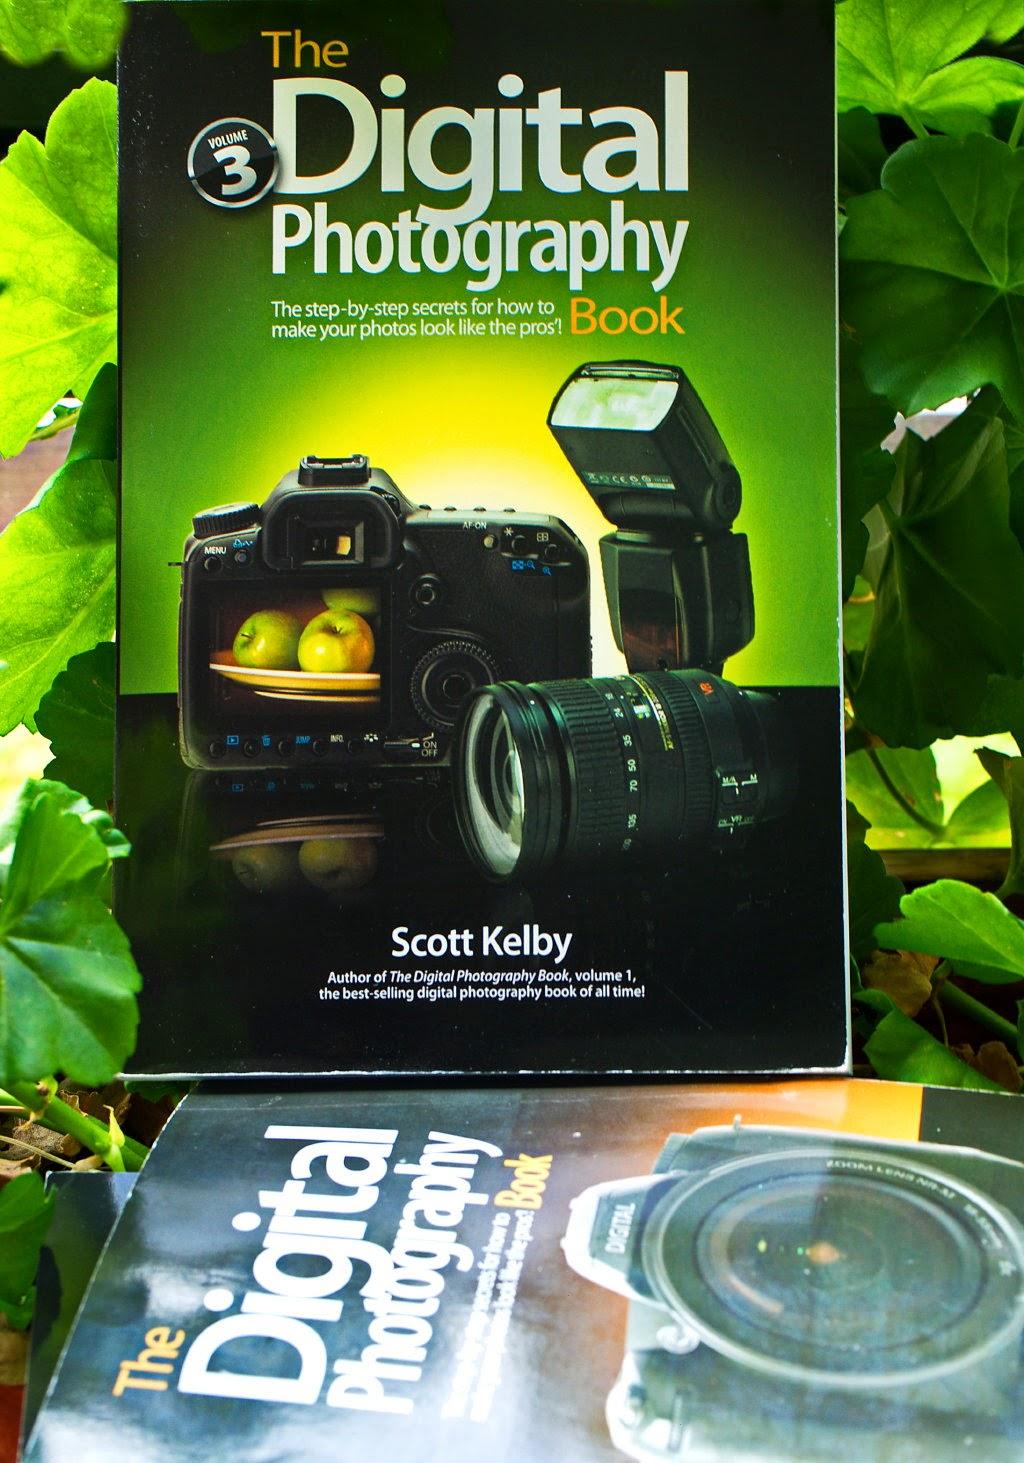 Digital Photography Book Cover : Reading randi announcement scott kelby worldwide